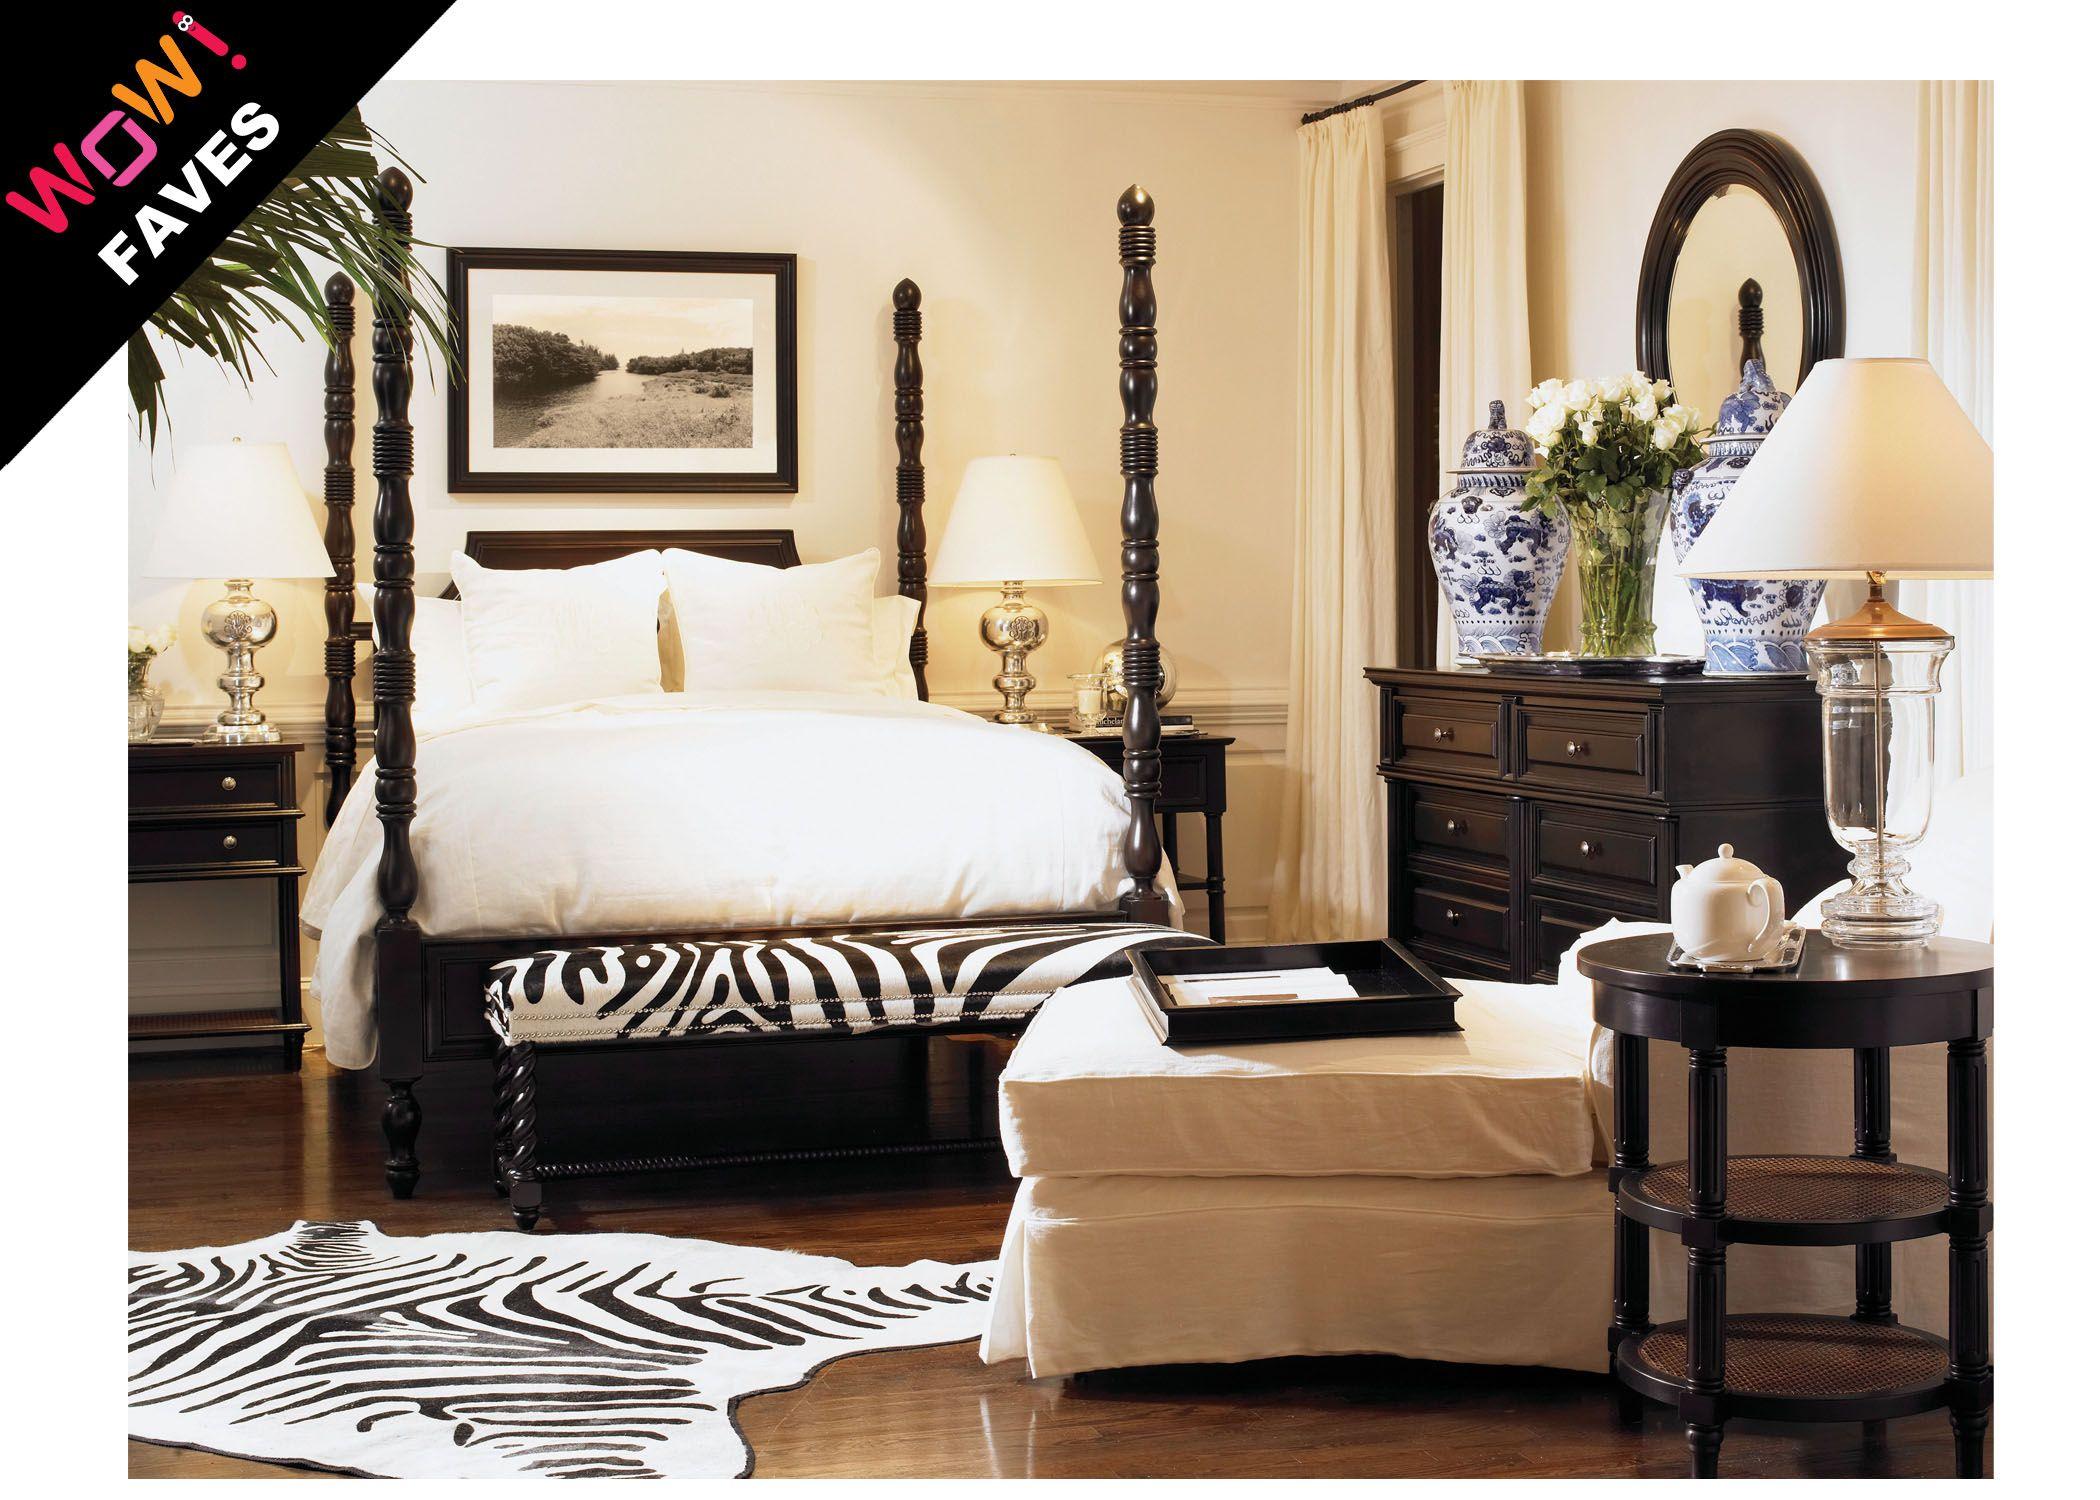 Bedrooms  Rooms & Ideas  Kings Home Furnishings